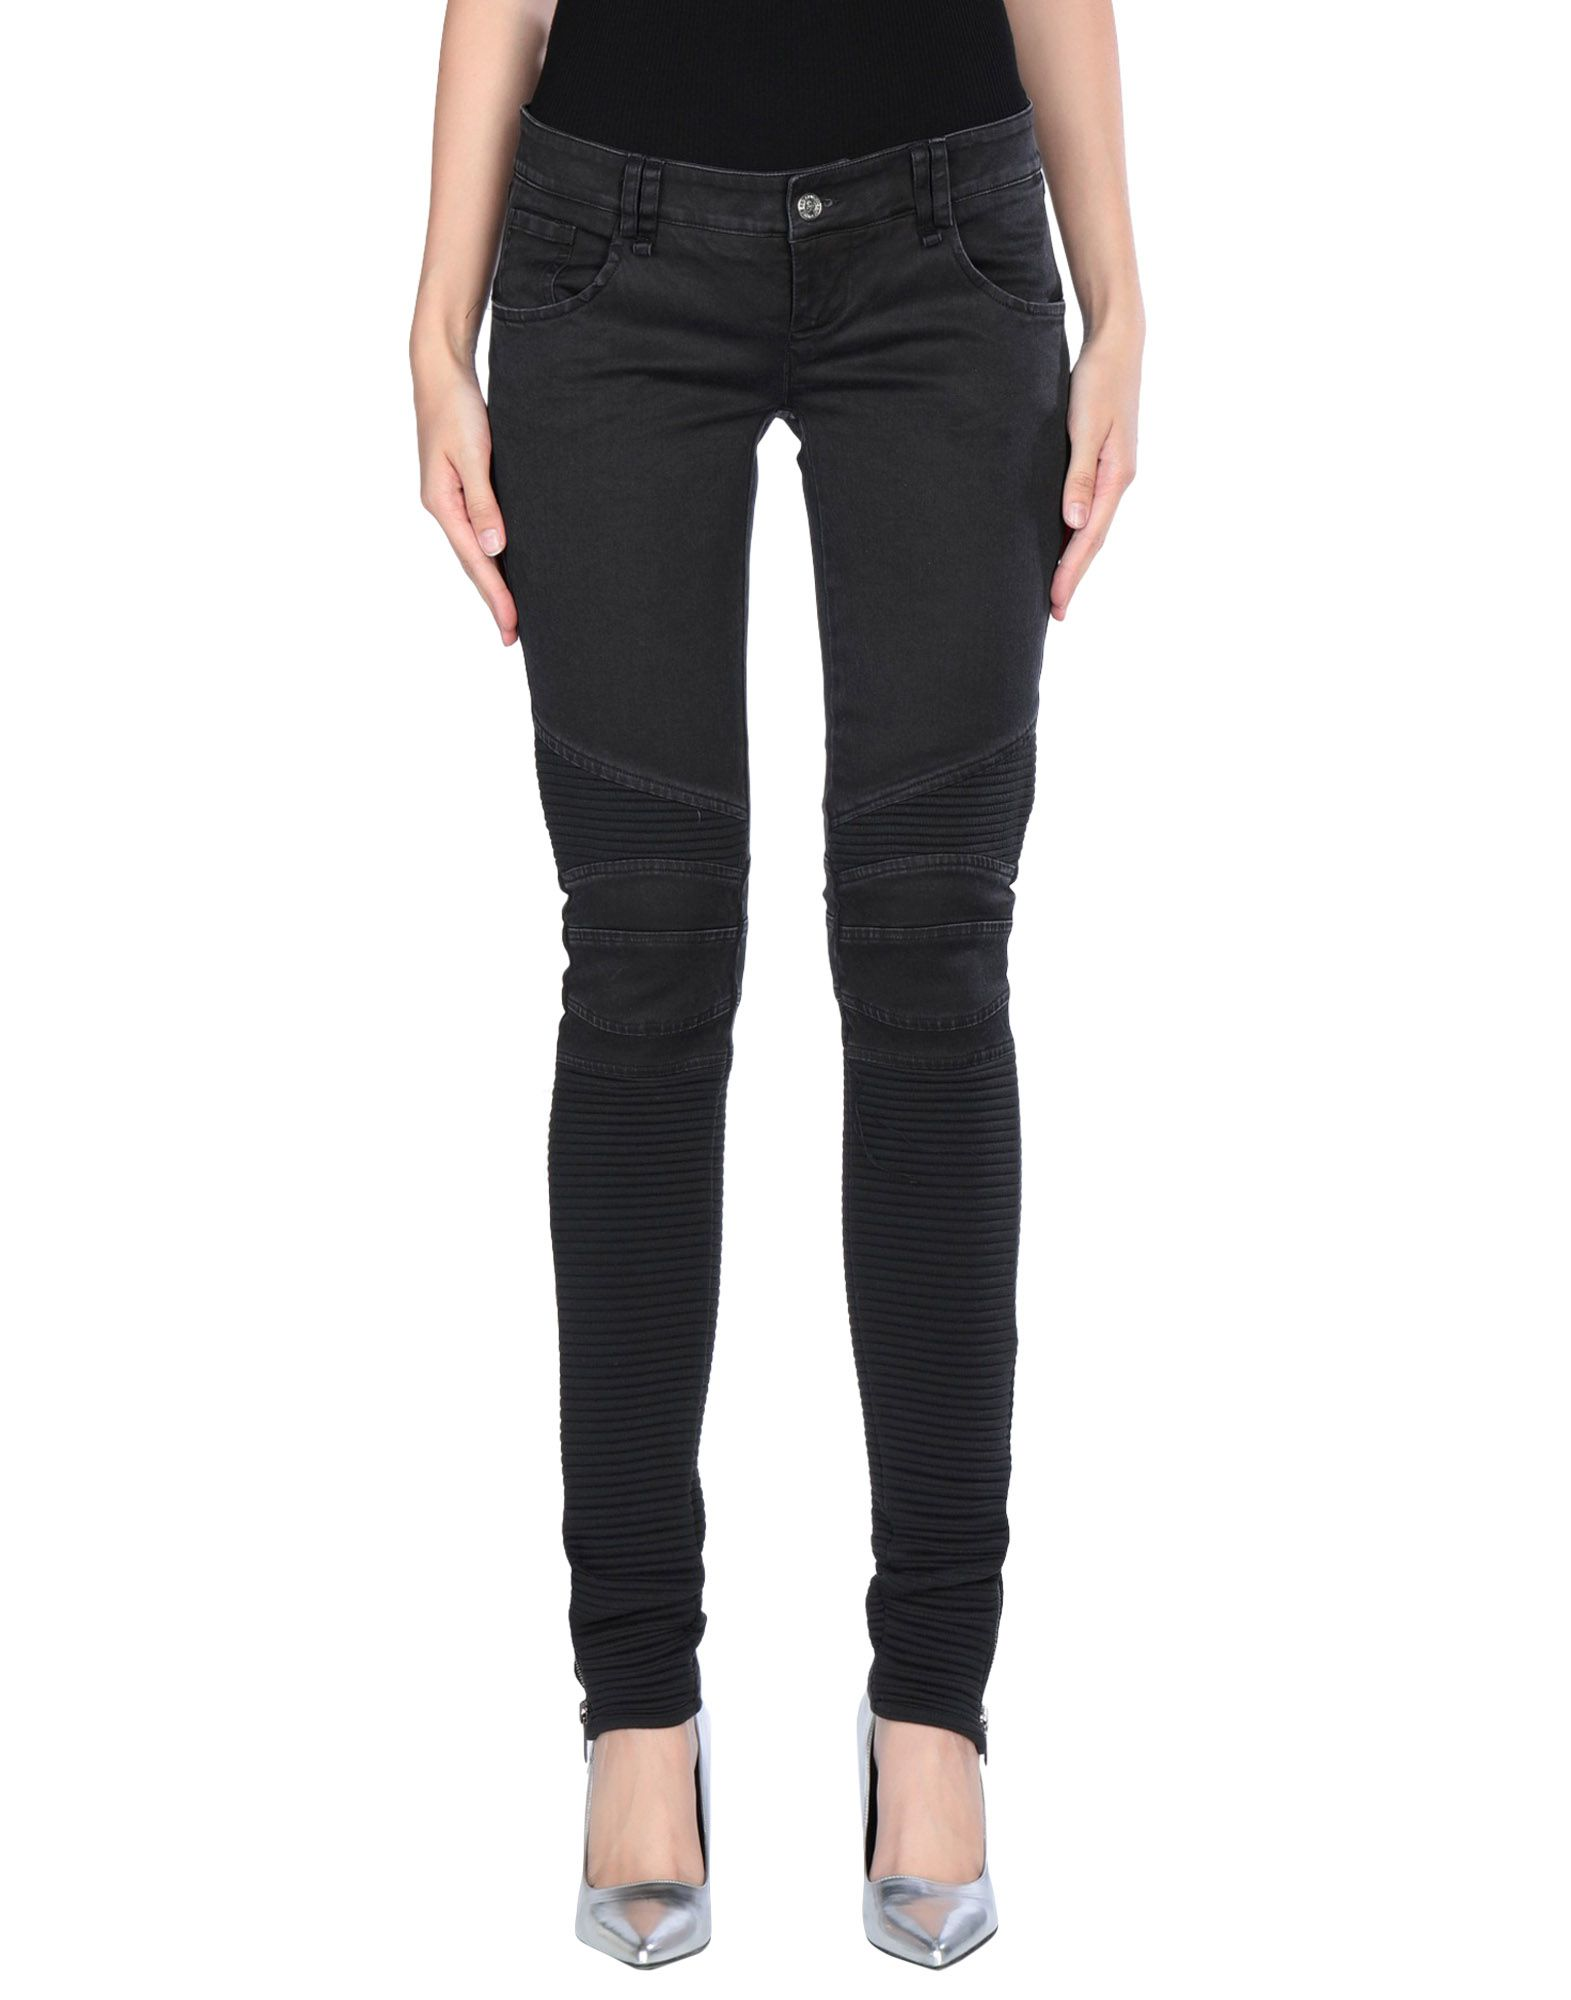 Spirit Online Yoox Acquista Donna Pantaloni Jeans 42689985ru Su Bad qfxPfZwz